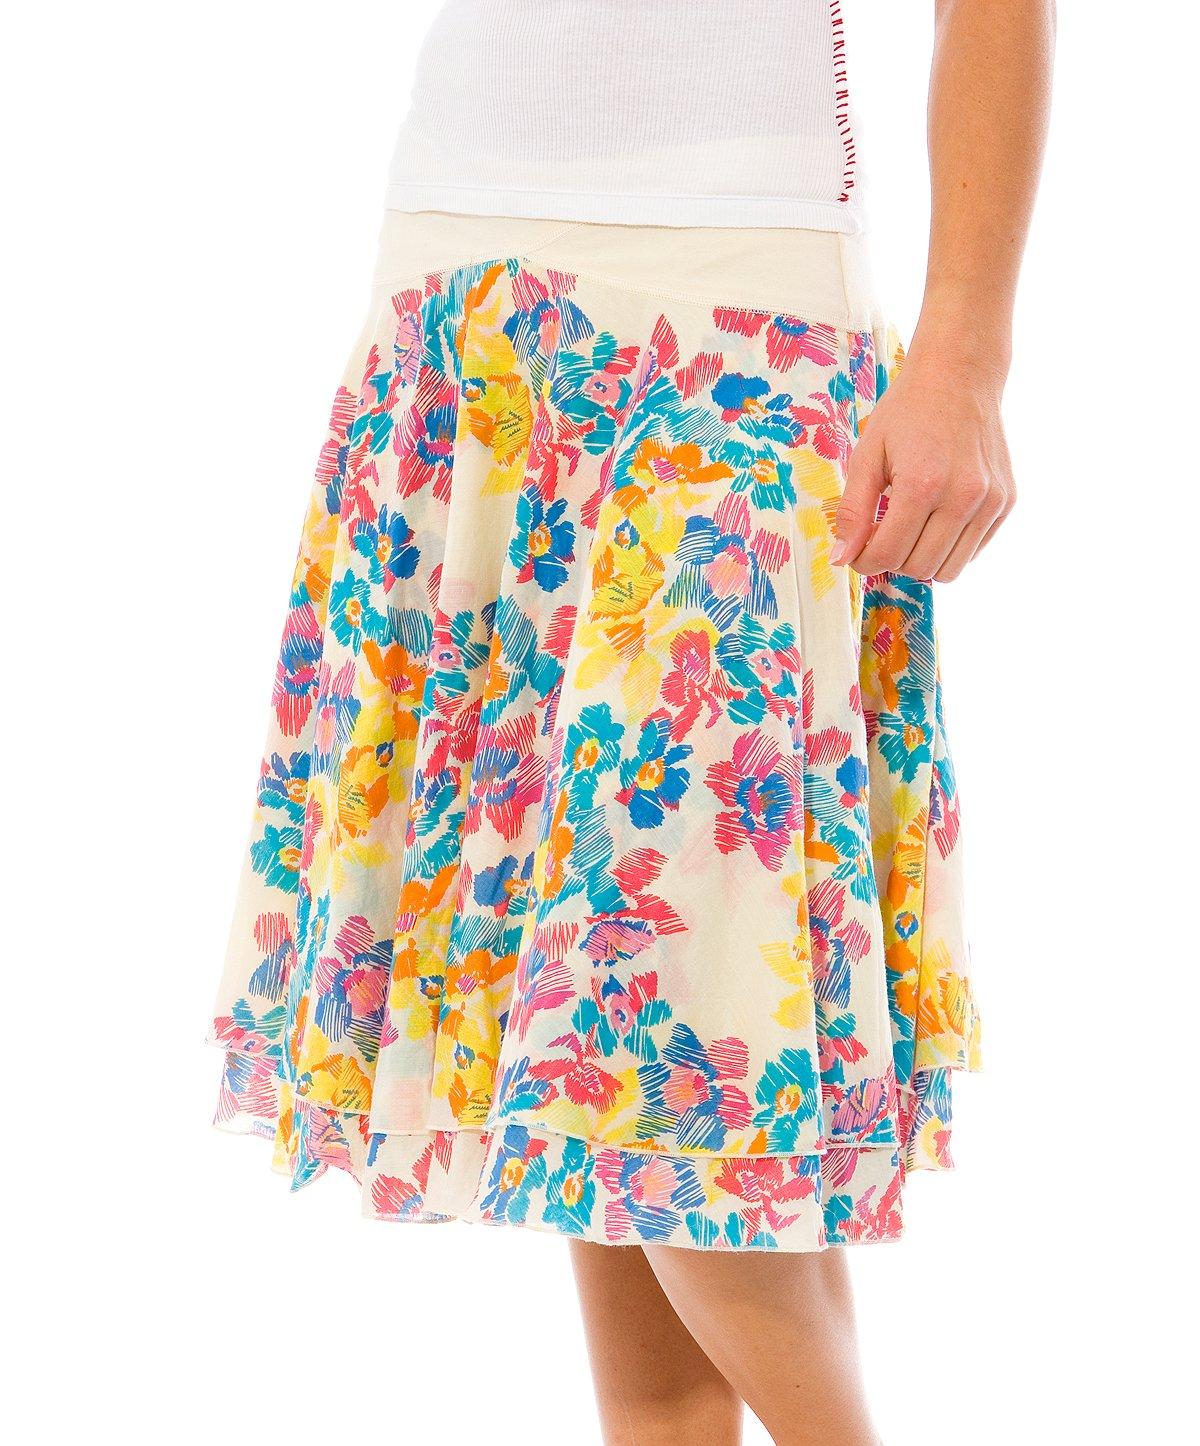 Sketch Flower Layered Yoke Skirt